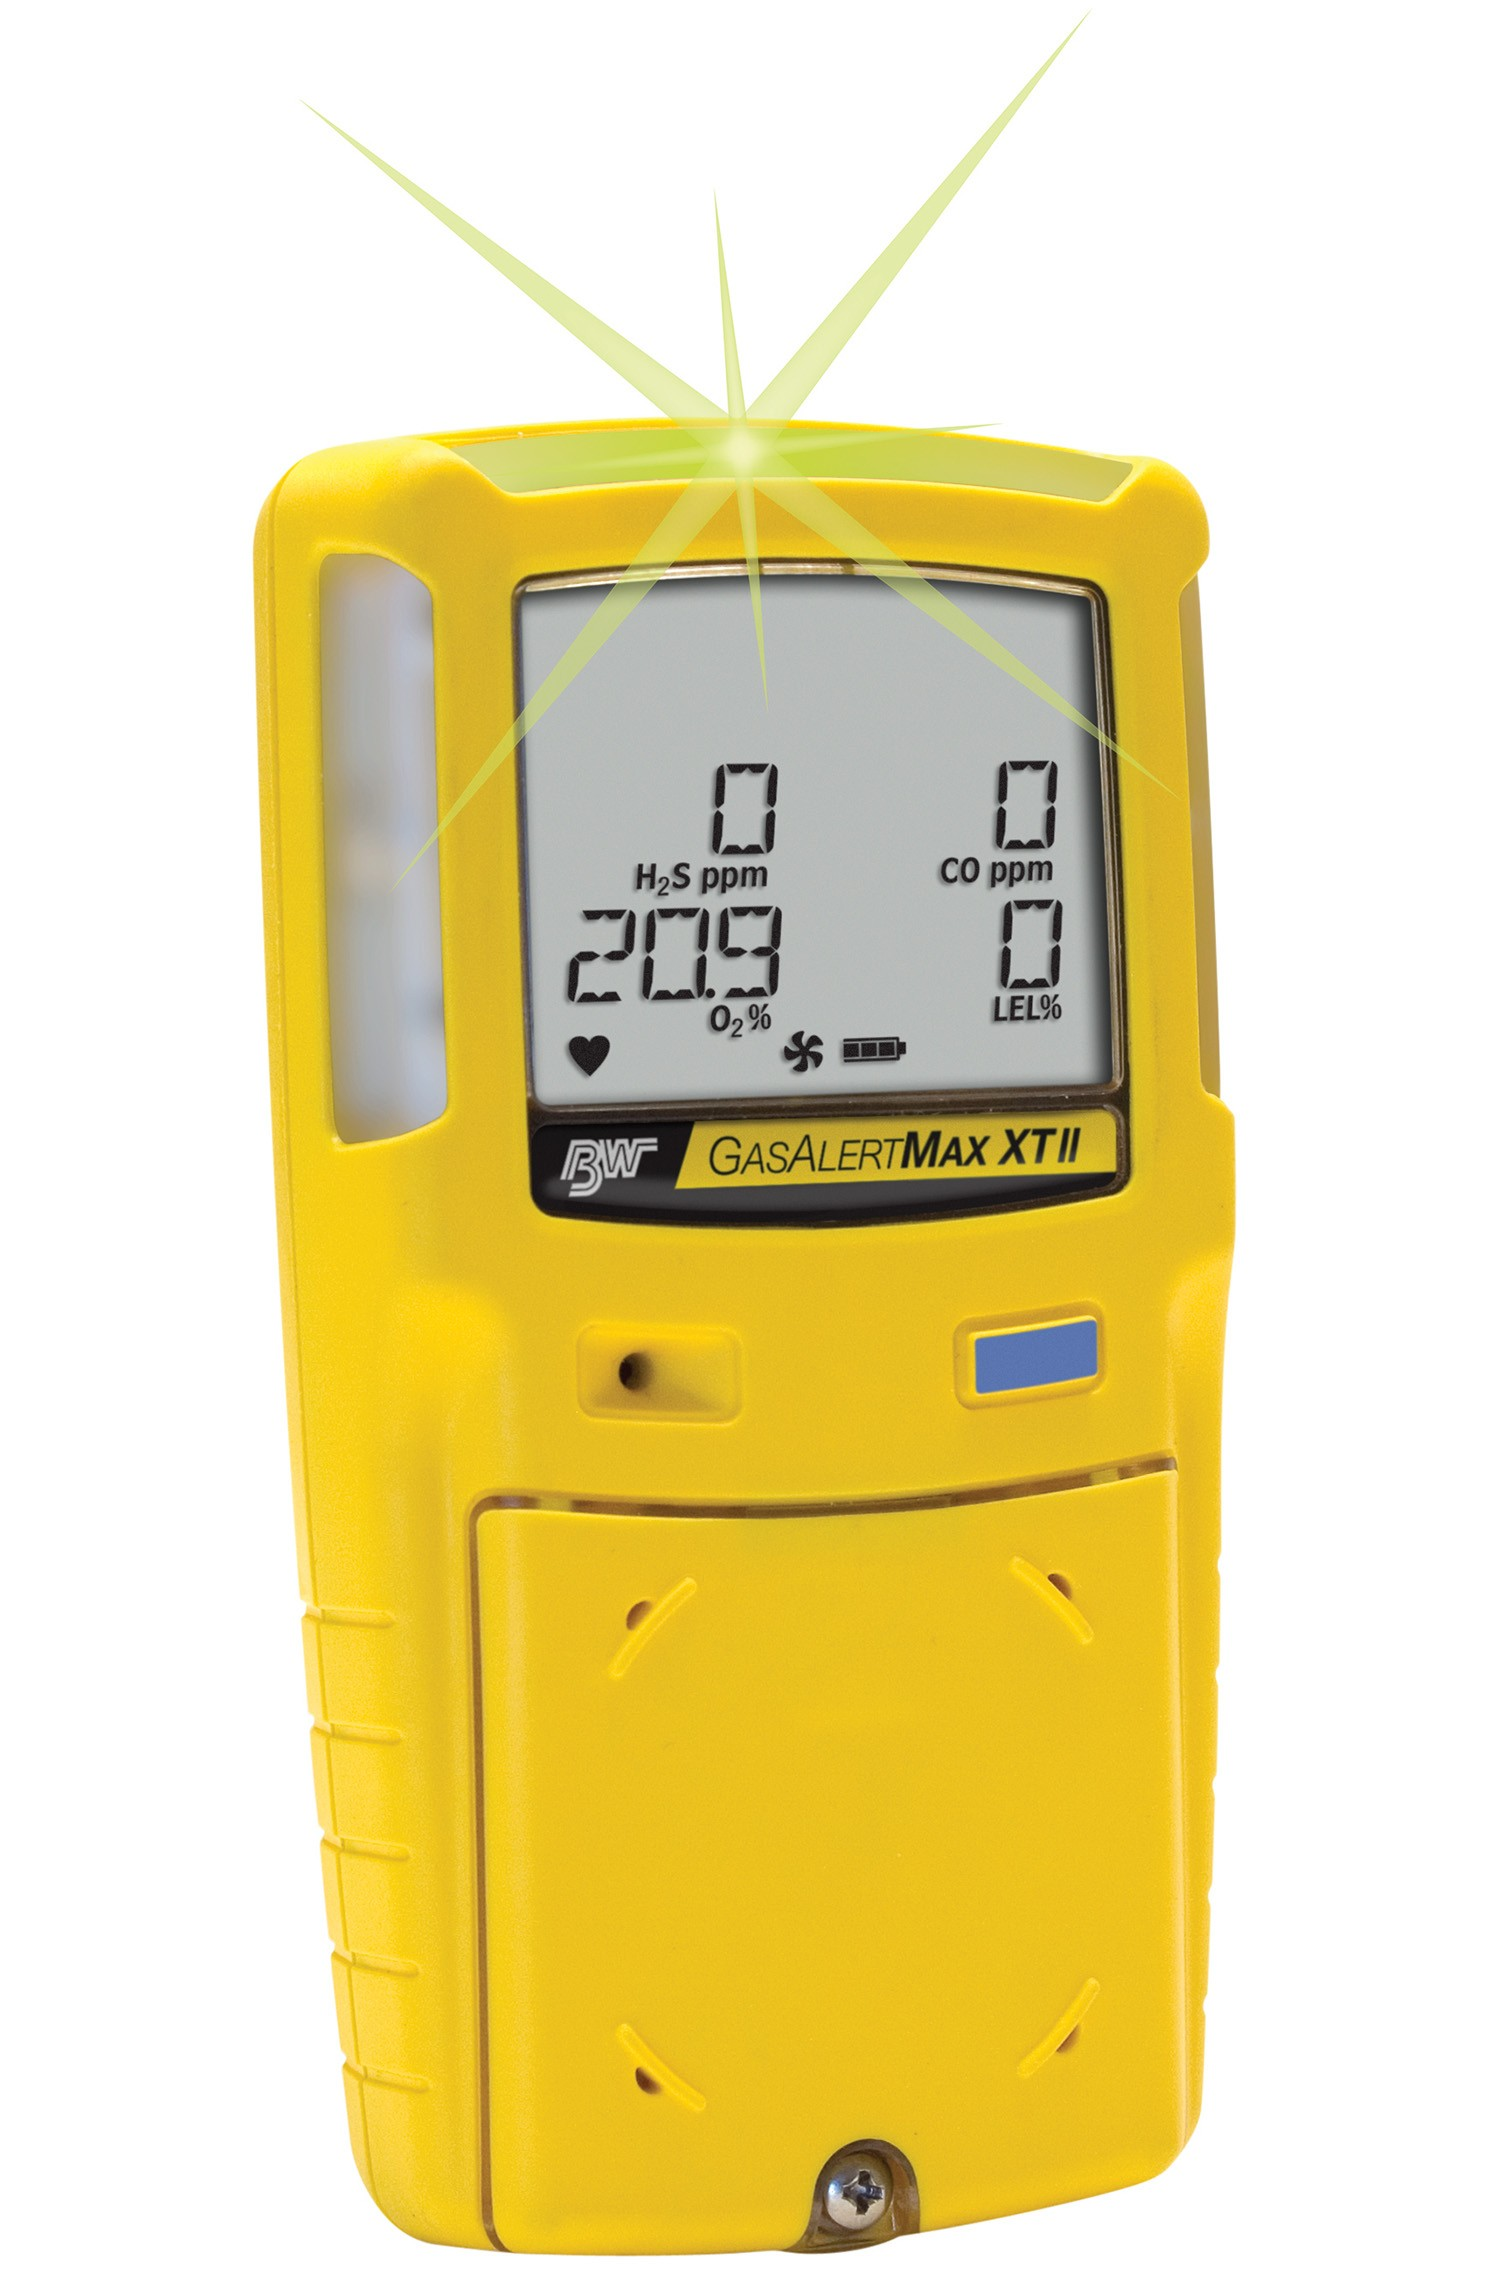 Honeywell MaxXT II Gas Alert Detector